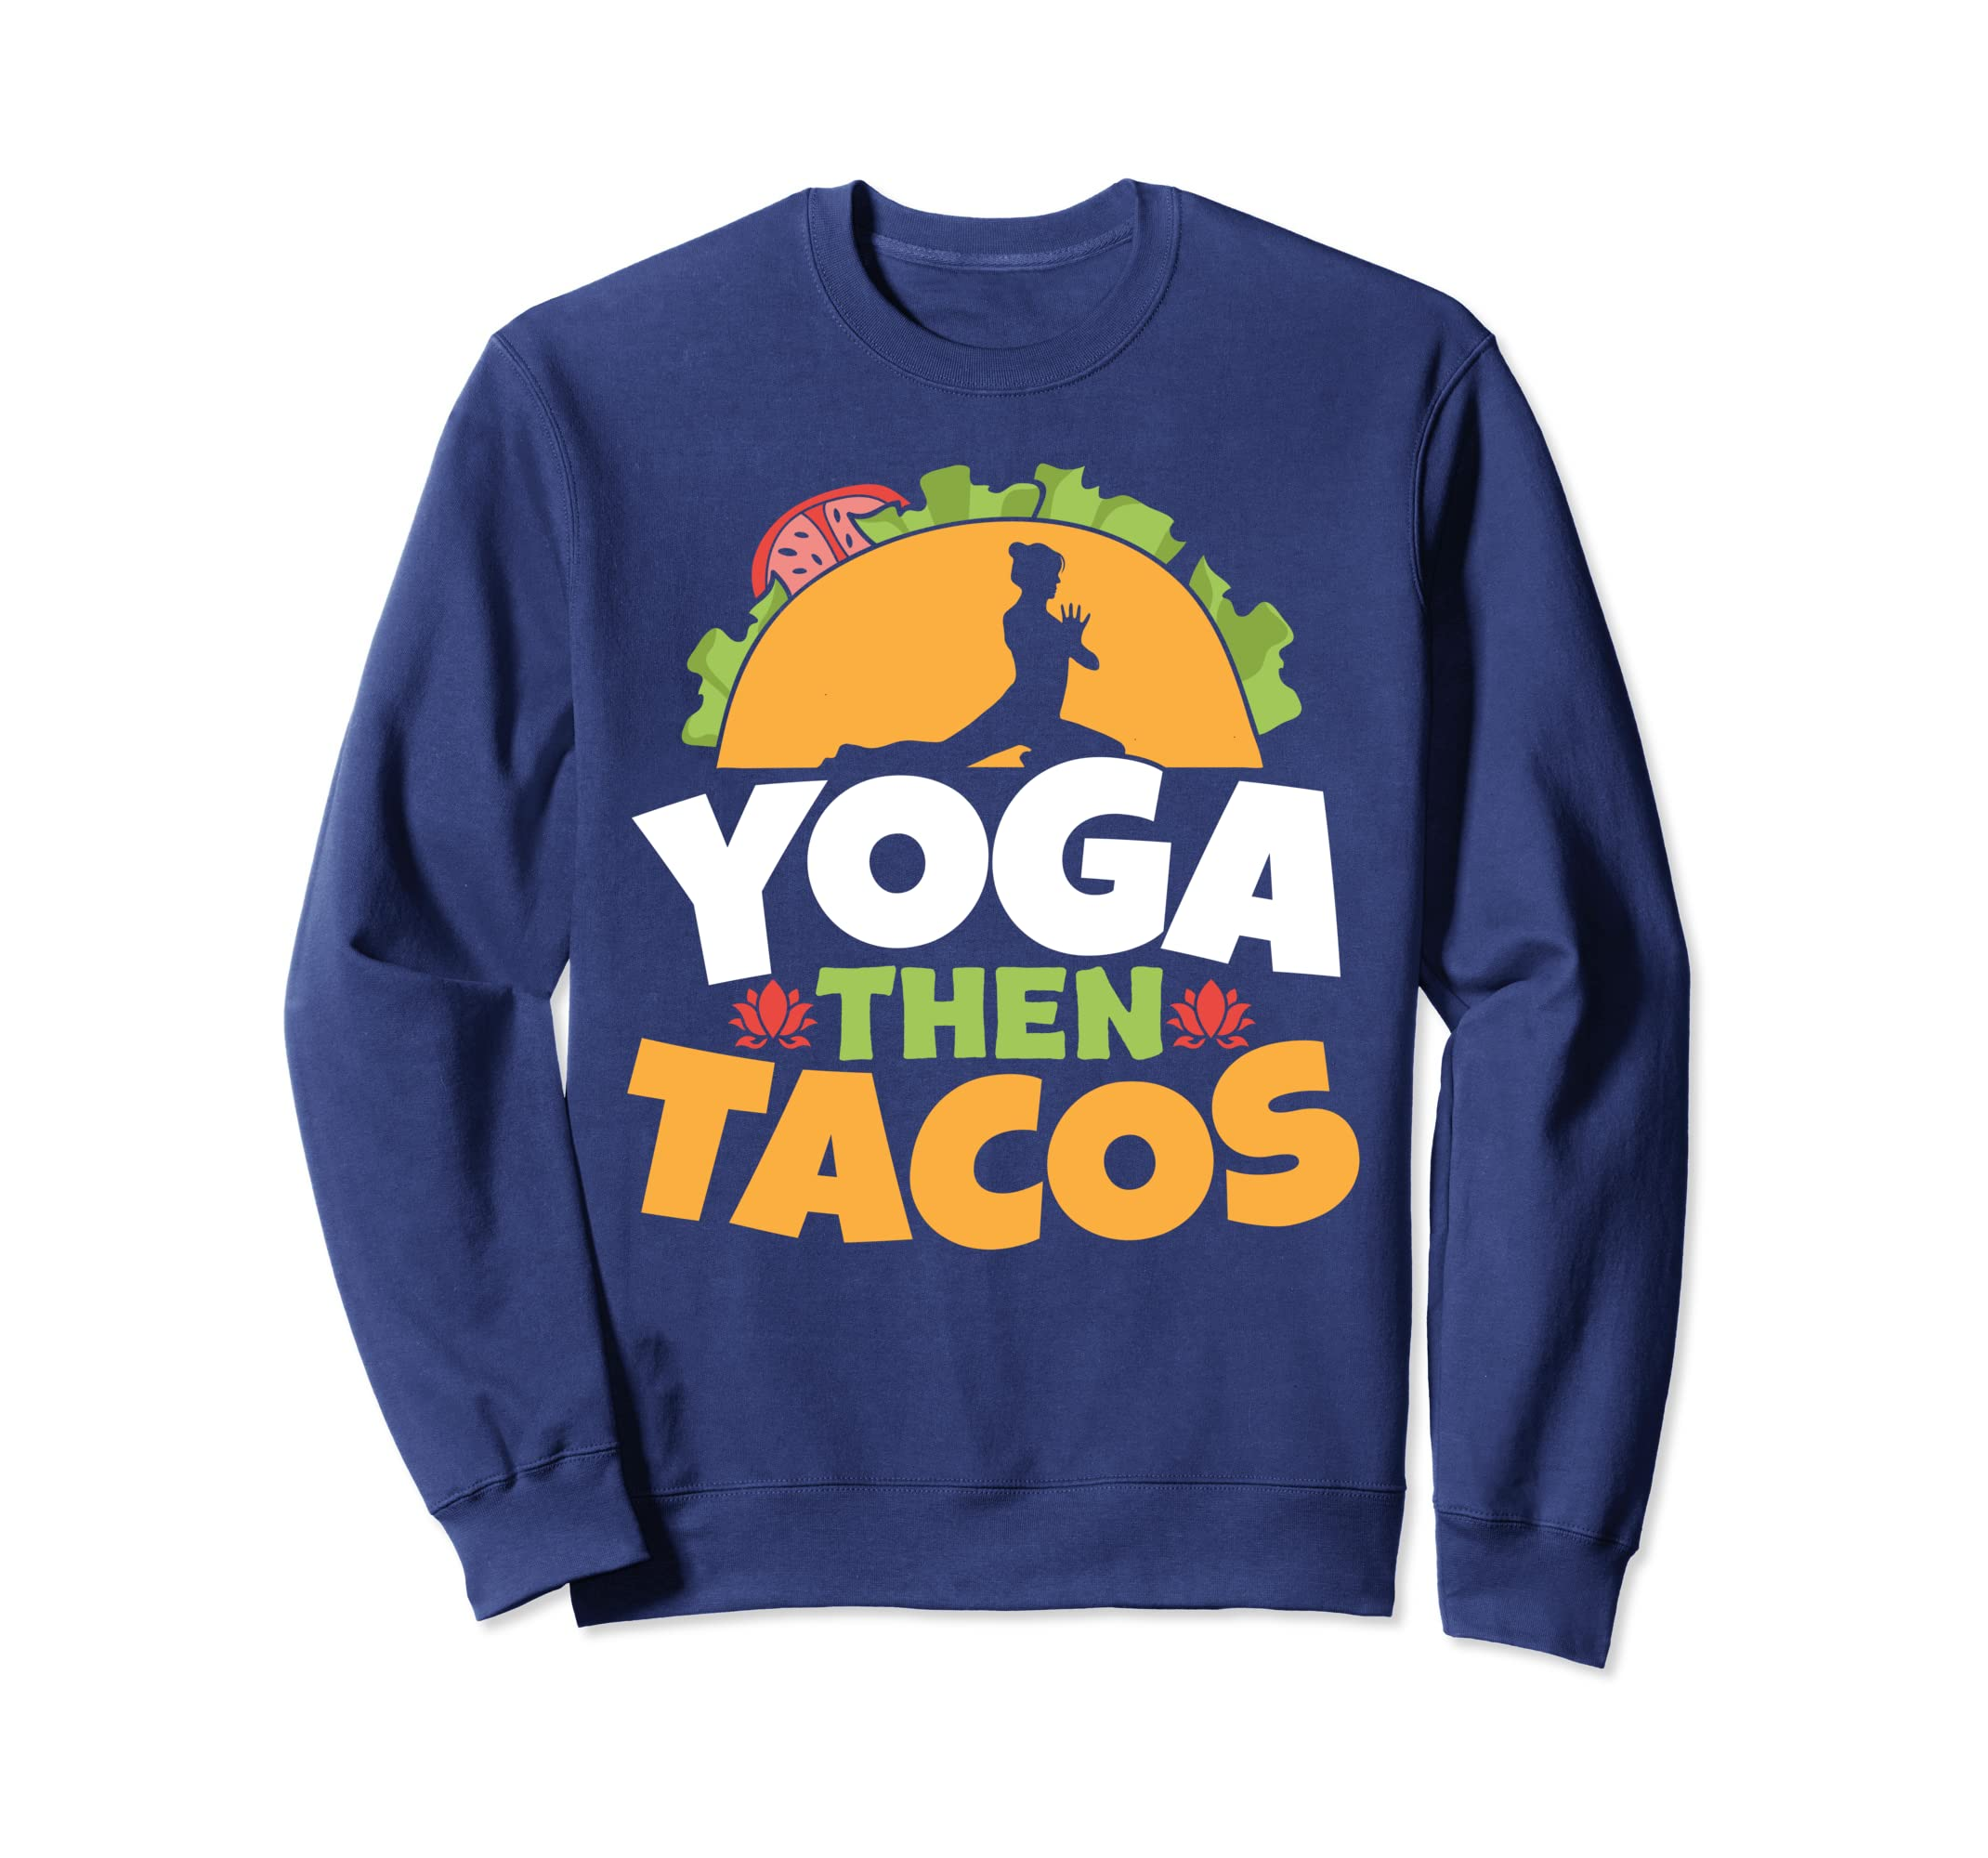 Amazon.com: Taco and Yoga Lovers Pigeon Pose Yoga Then Tacos ...